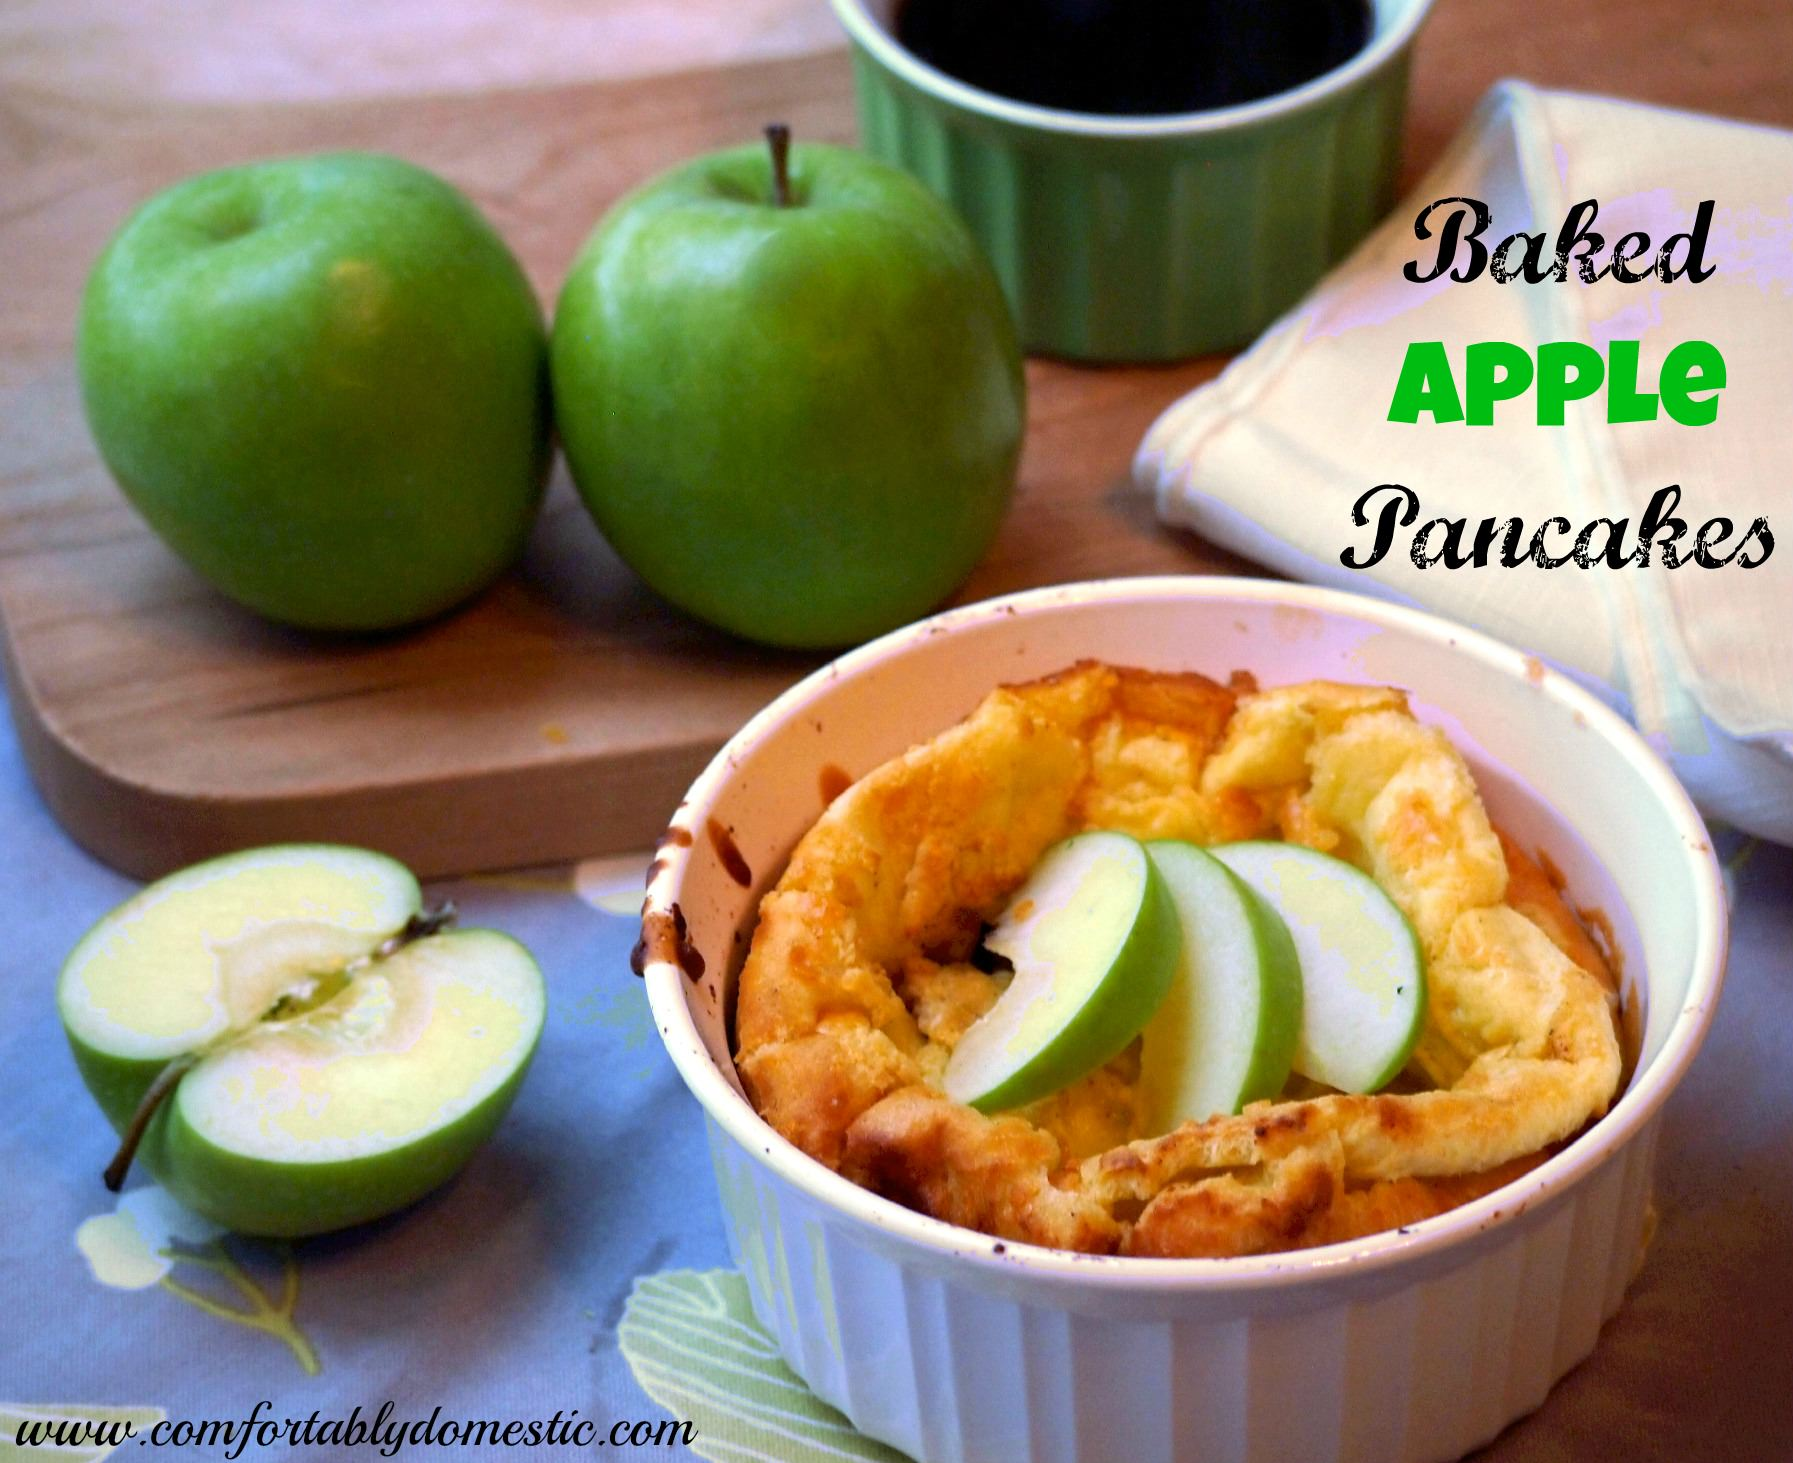 Baked Apple Pancakes via ComfortablyDomestic.com